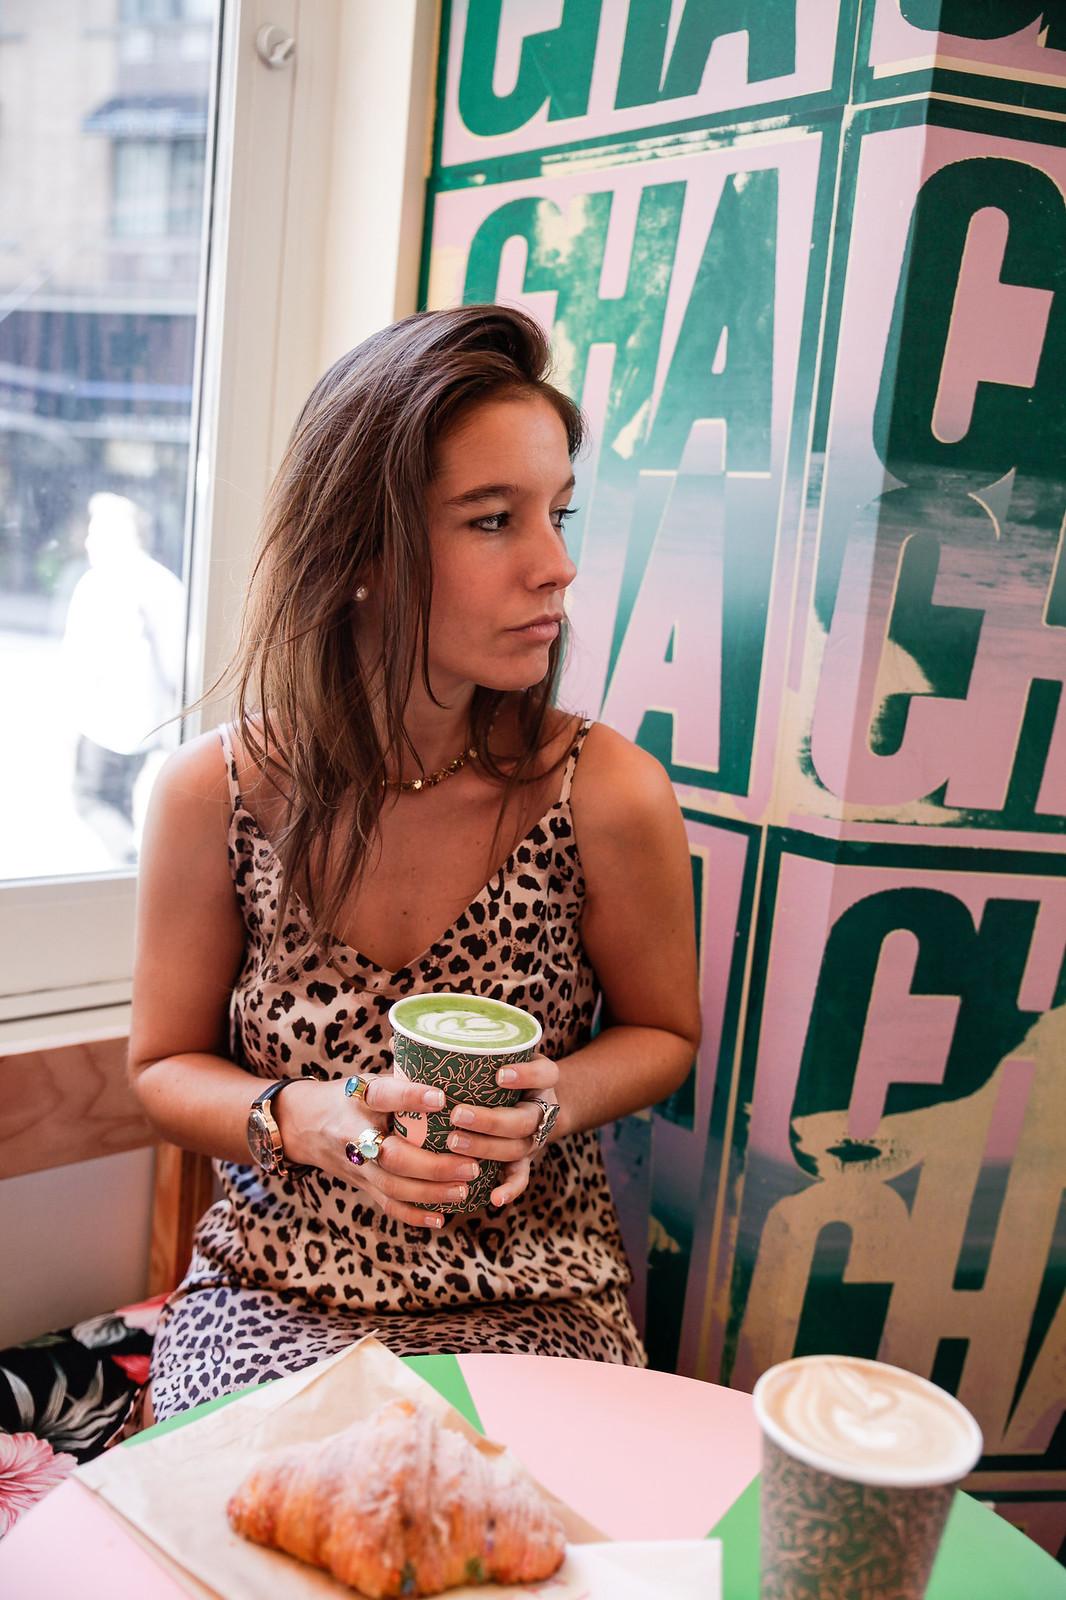 05_cha_cha_matcha_cafeteria_rosa_nueva_york_el_mejor_matcha_unicorn_croissant_breakfast_theguestgirl_nyc